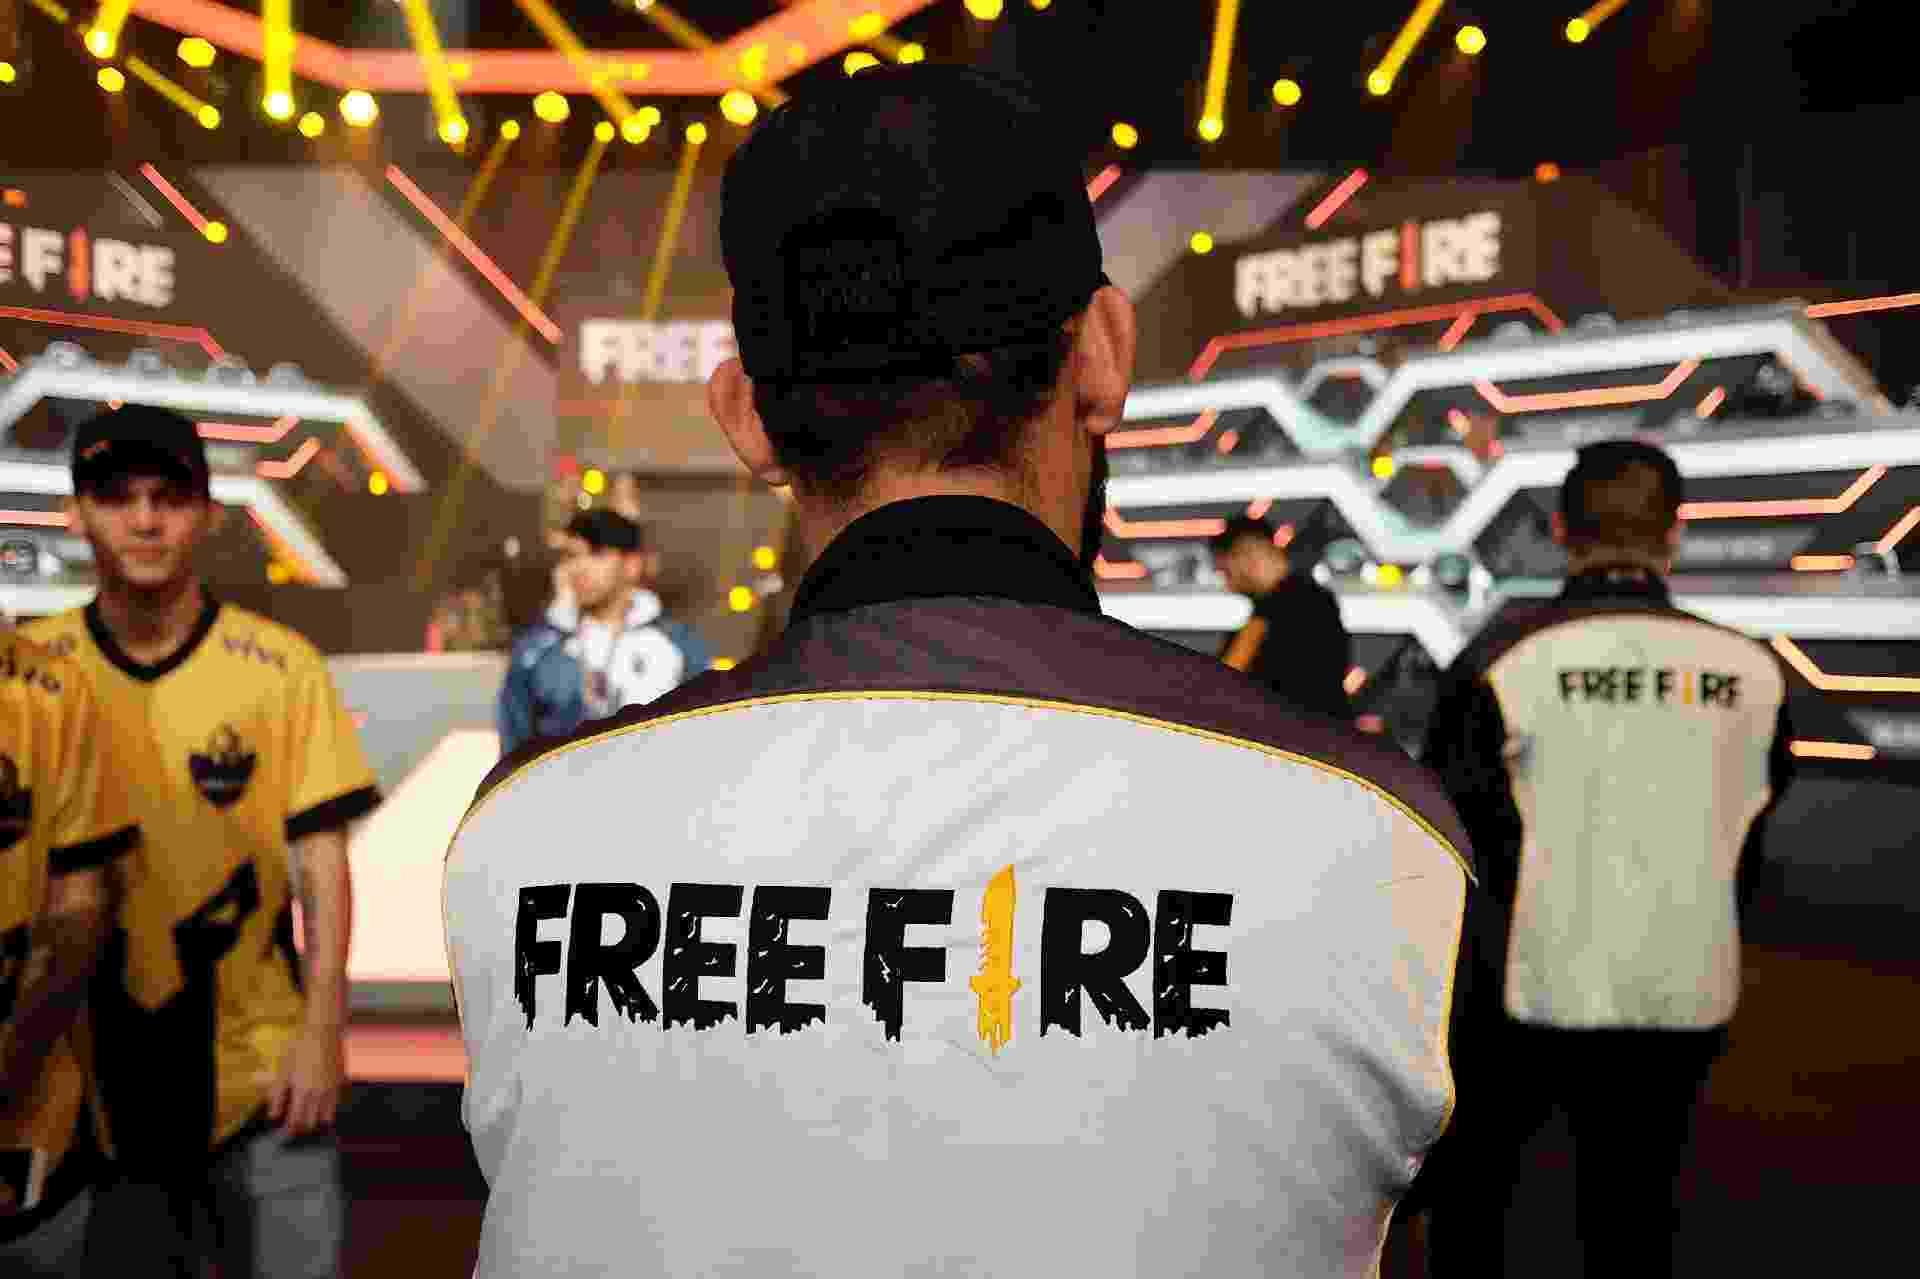 Estúdio Free Fire Garena - Renato Bueno/UOL